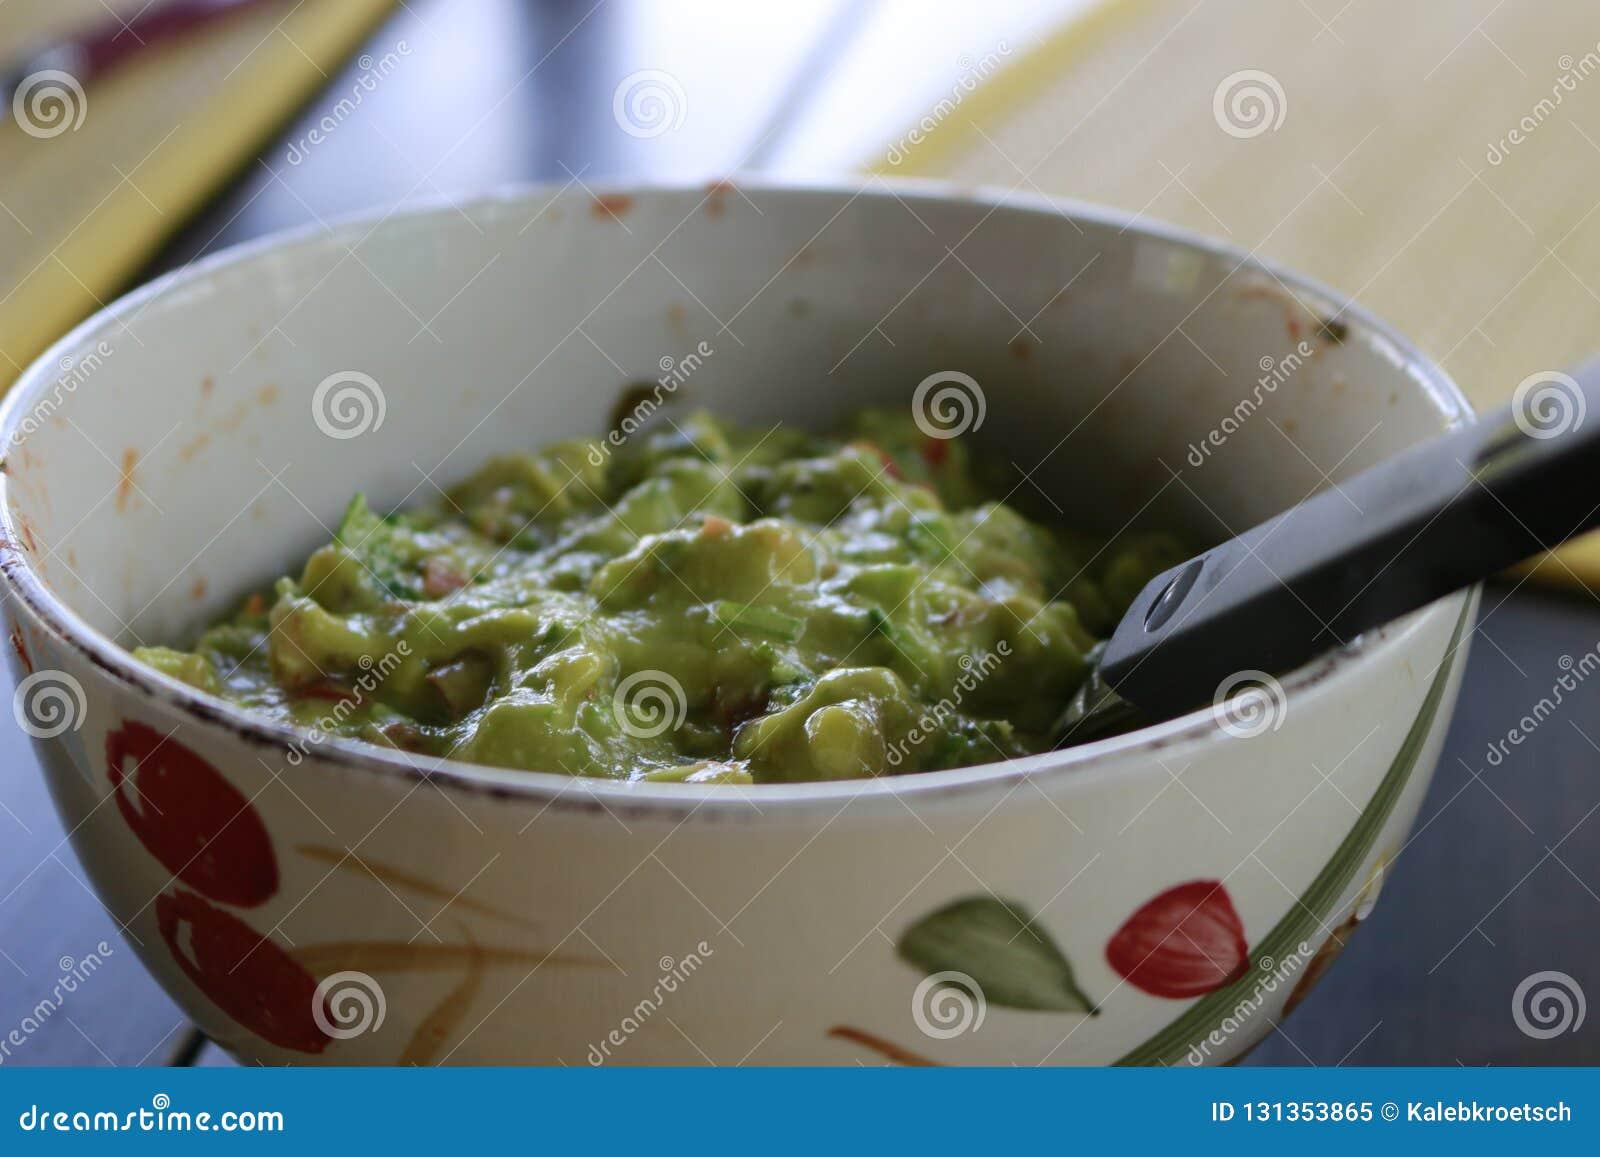 Avocado Guacamole On Molcajete Real Mexican Traditional